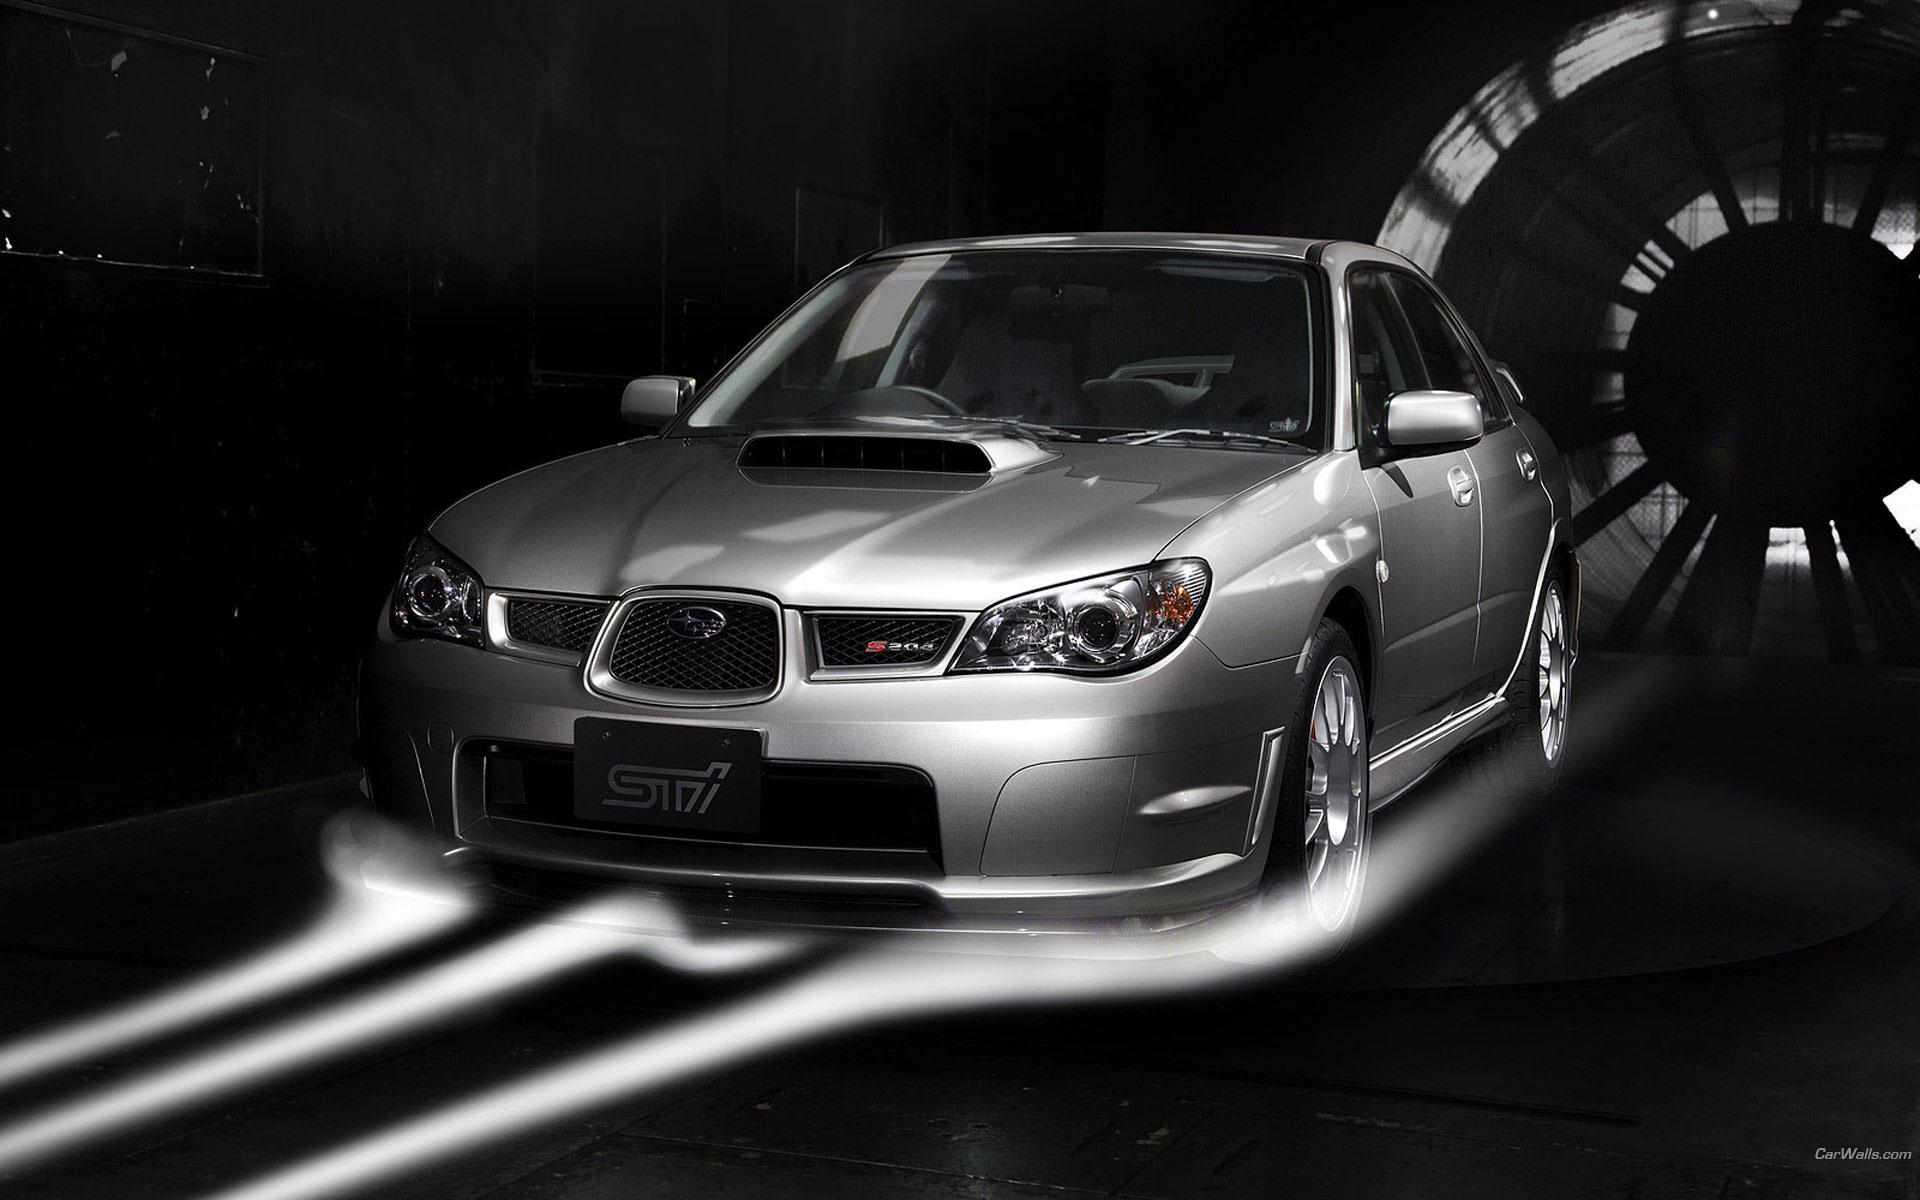 Subaru Impreza Wrx Sti Hd Wallpaper